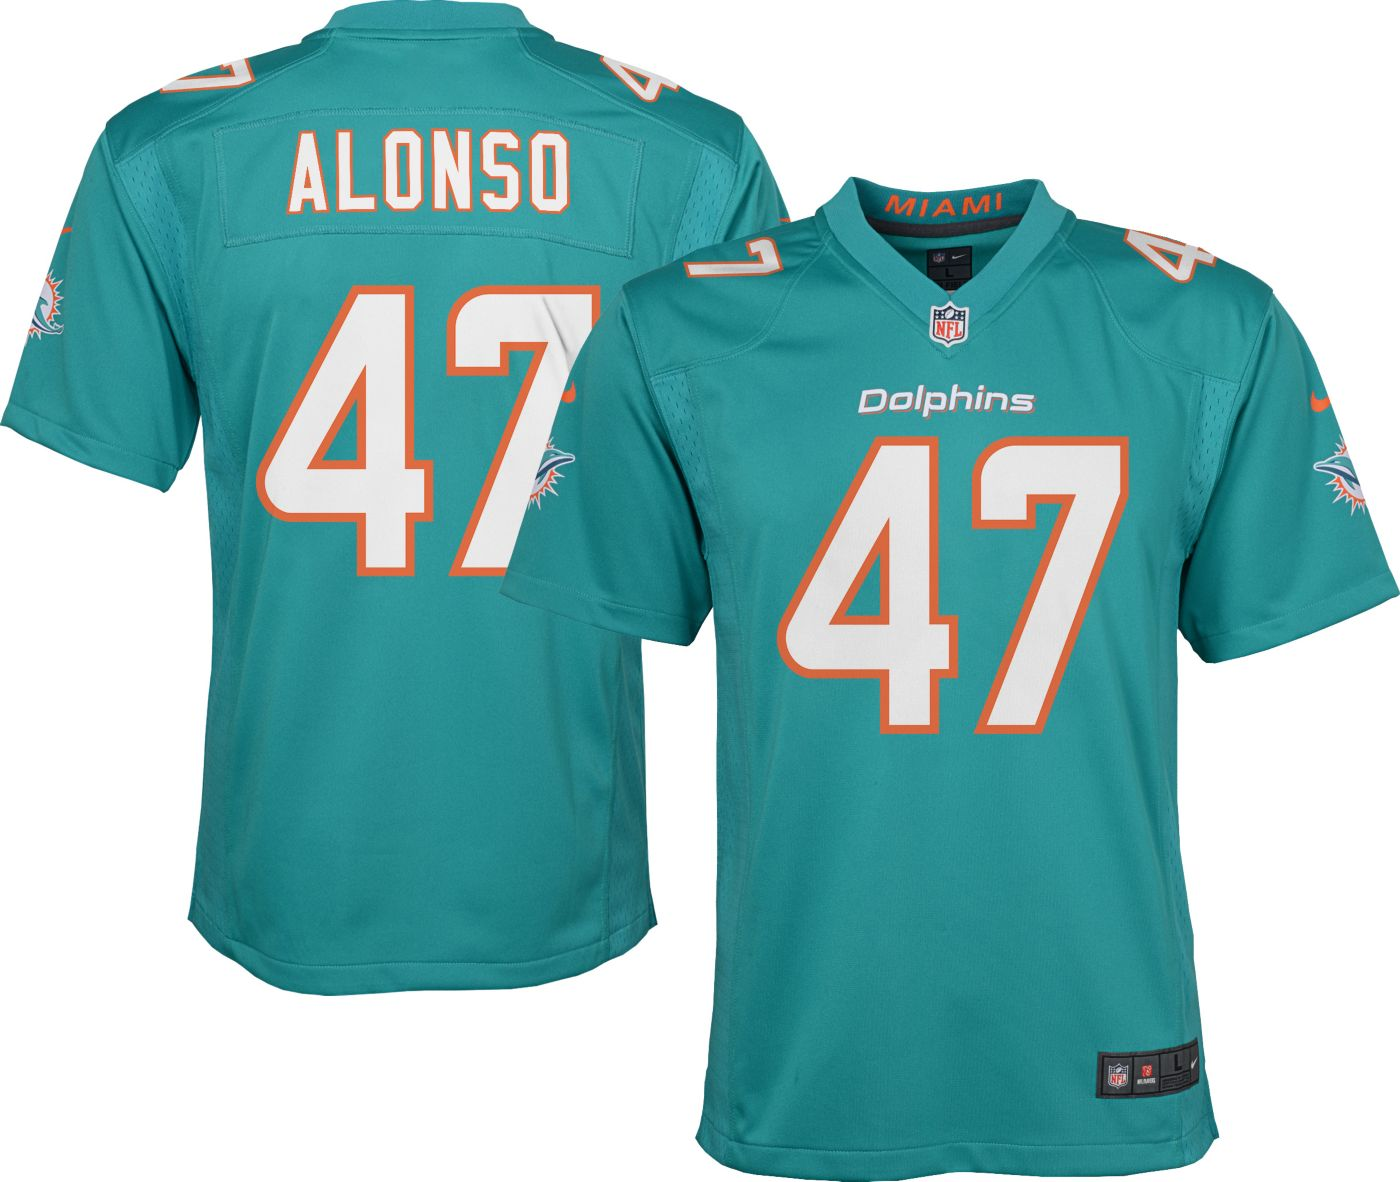 Nike Youth Home Game Jersey Miami Dolphins Kiko Alonso #47